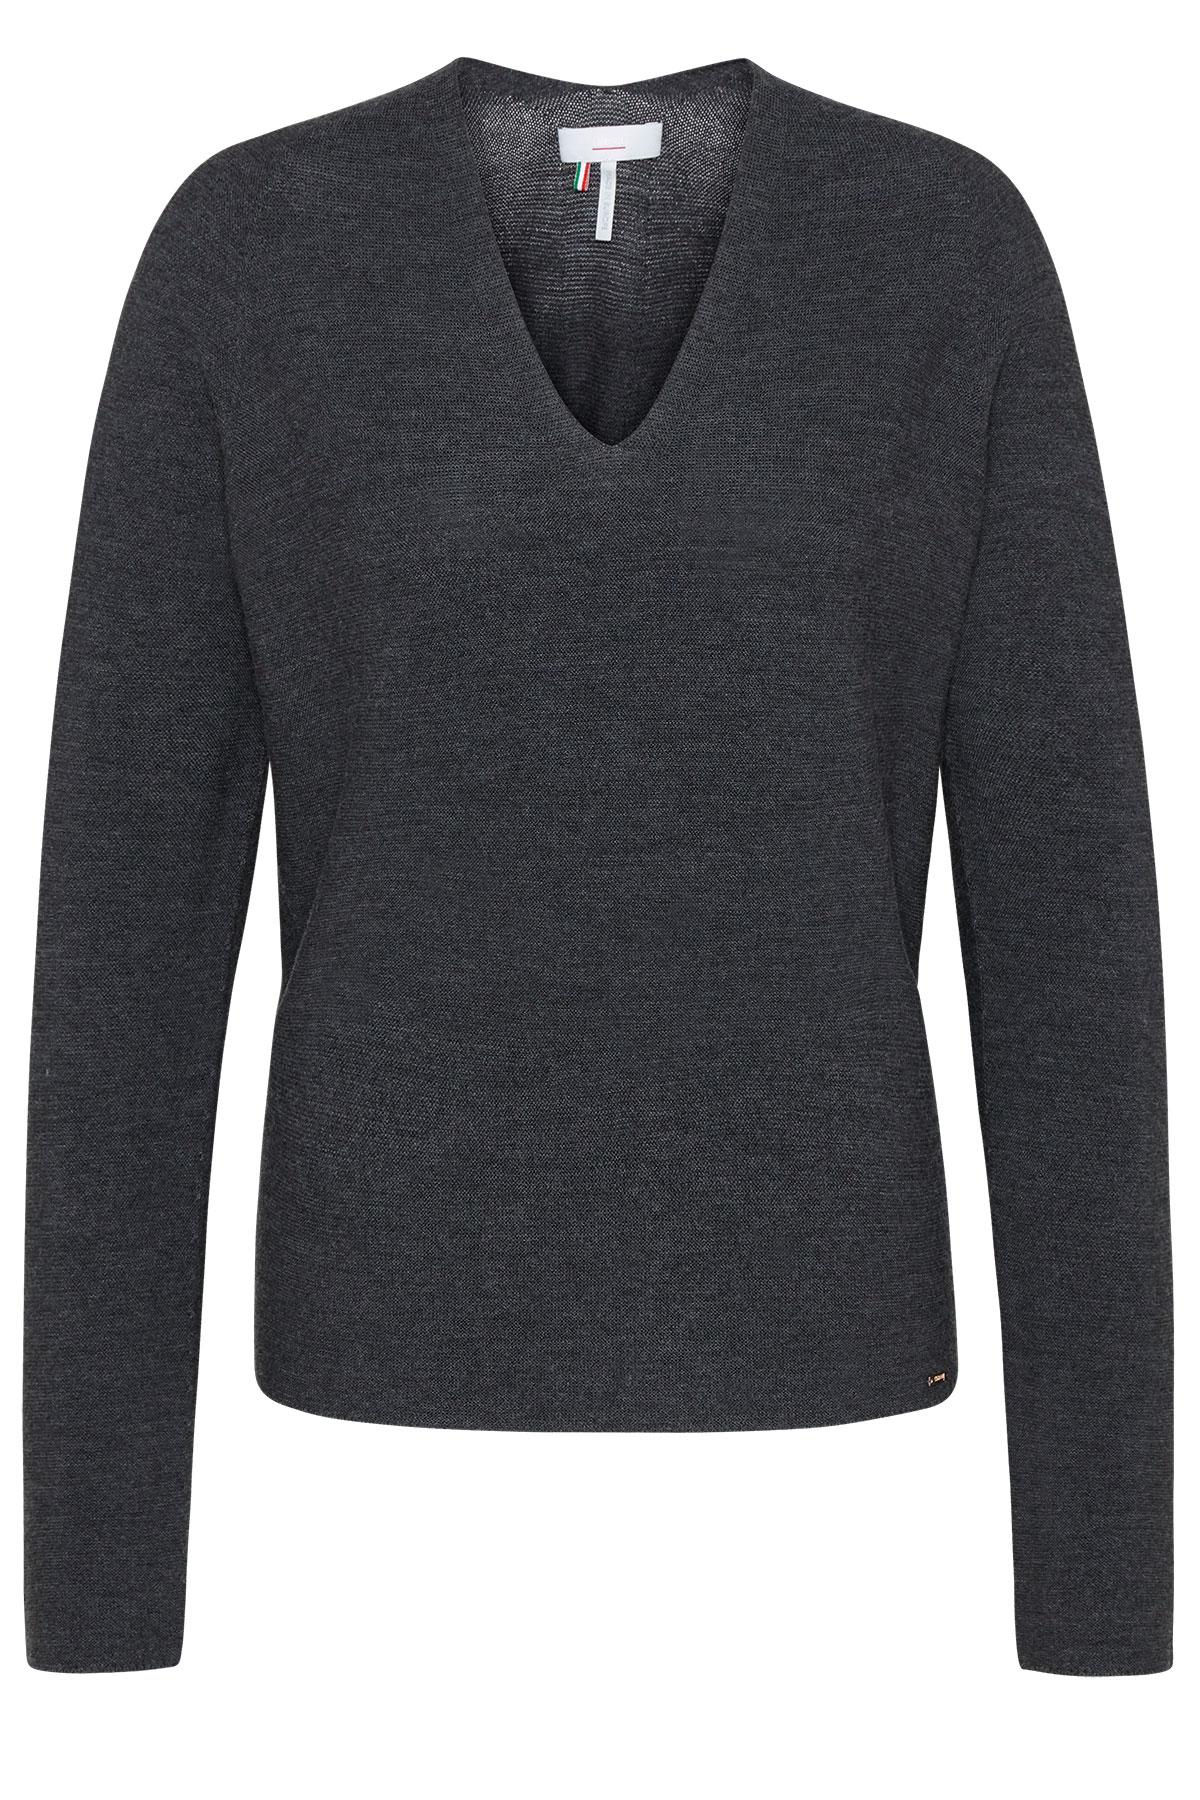 Cinque Pullover grau